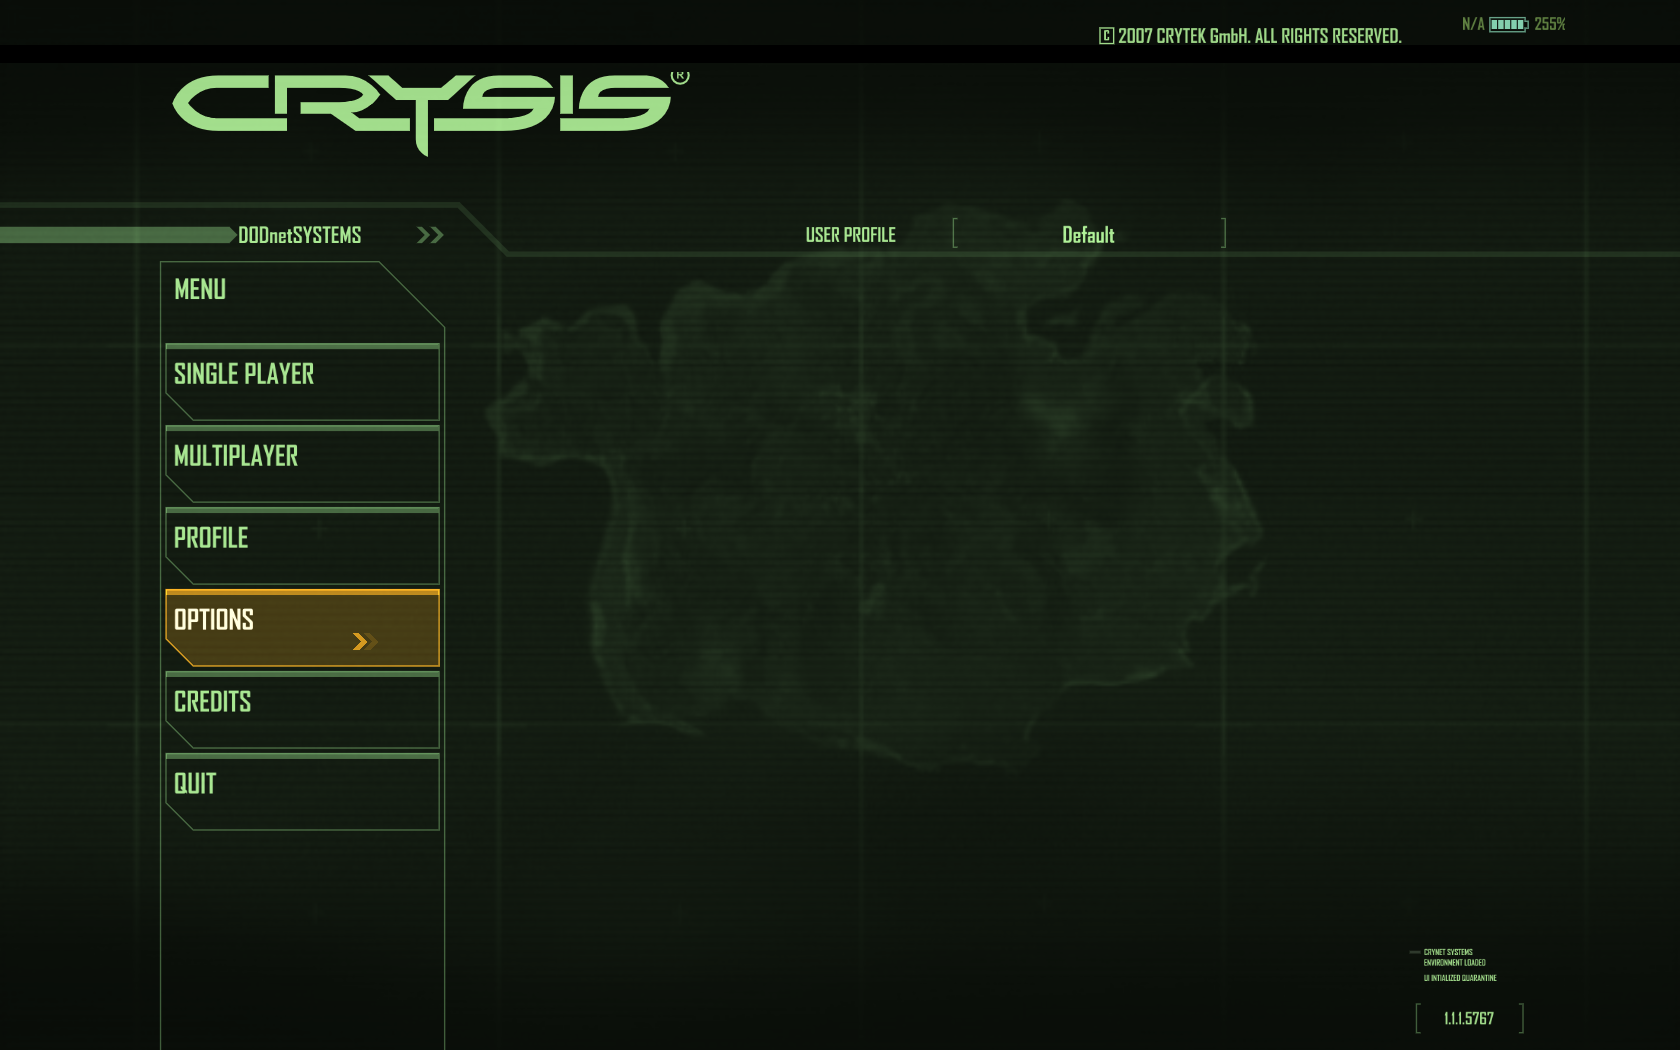 crysis37.png